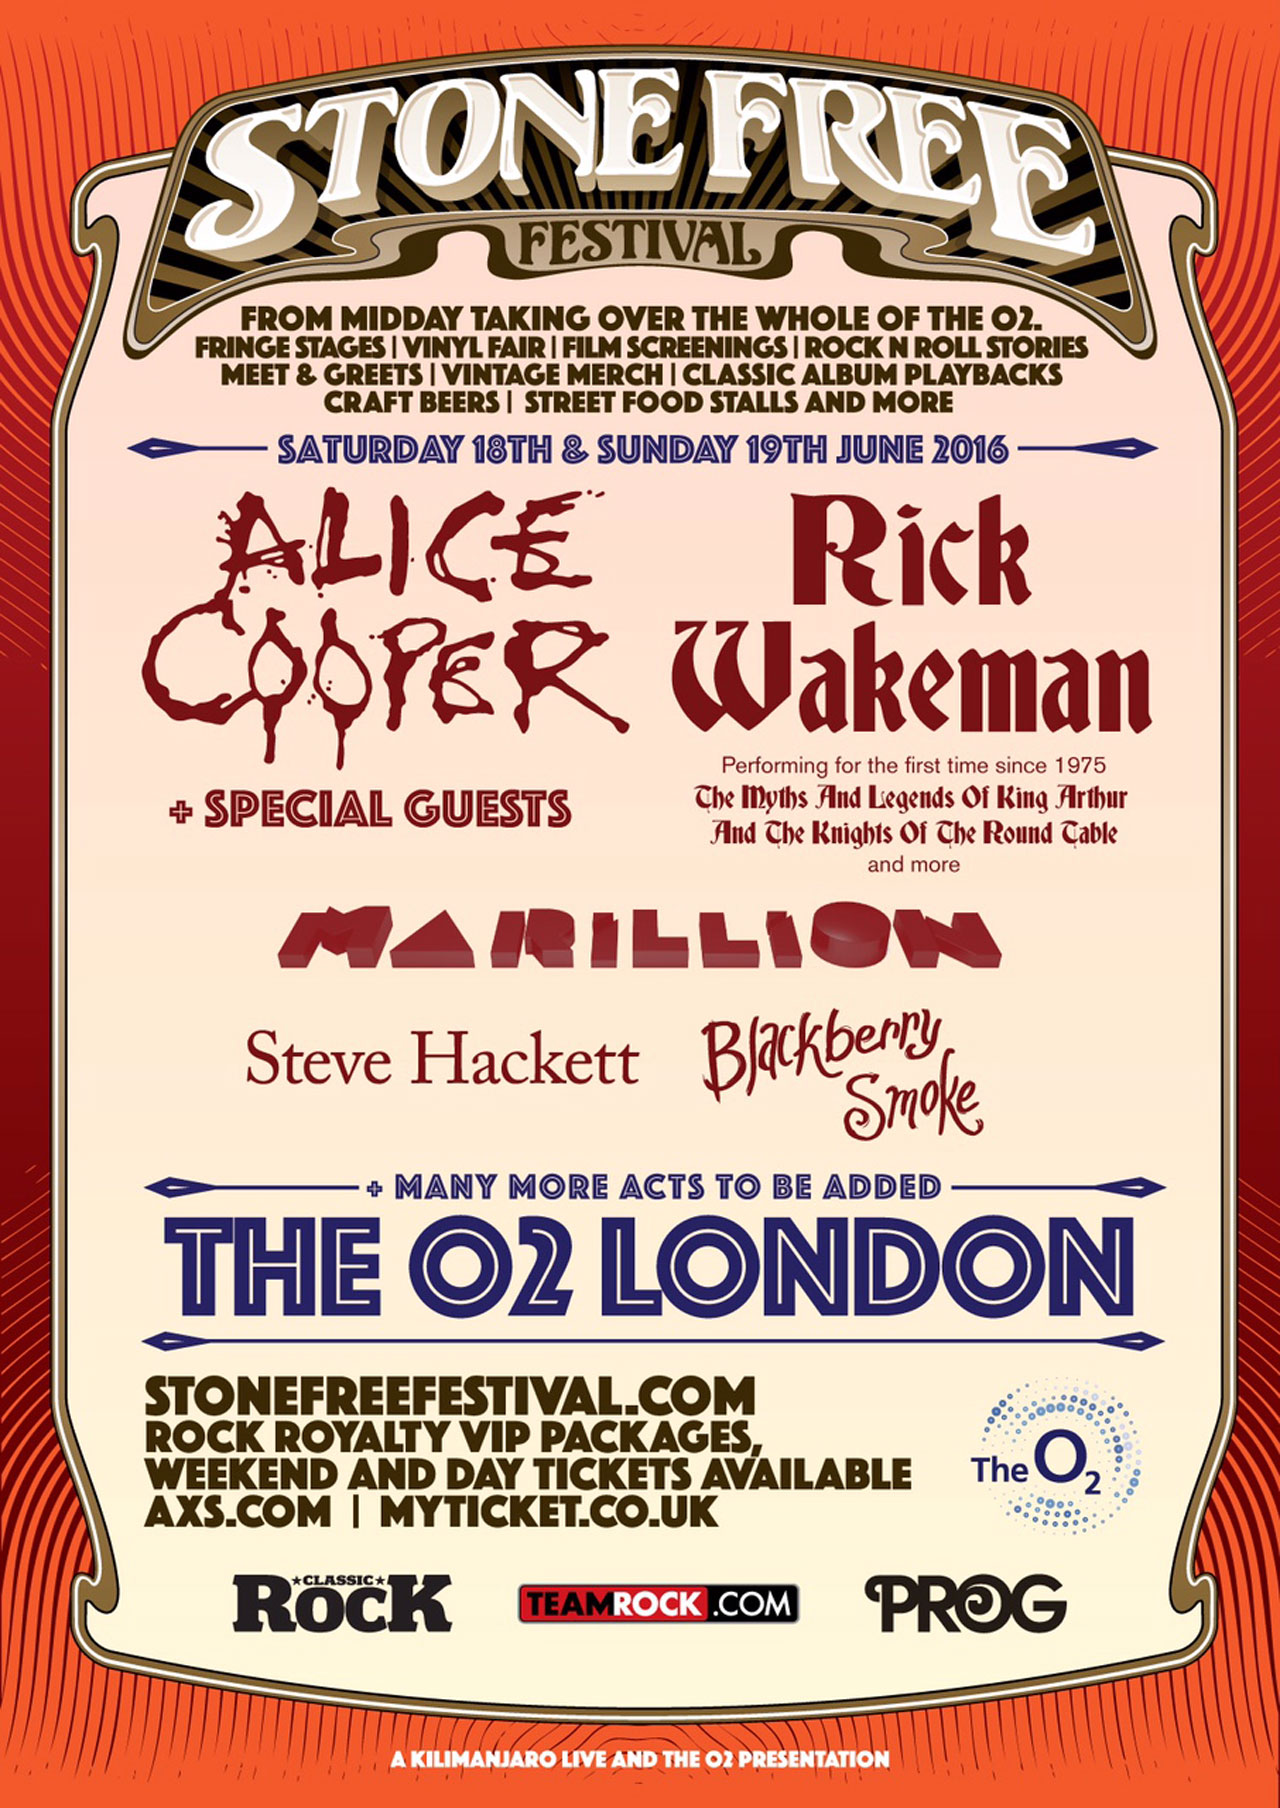 Alice Cooper Rick Wakeman To Headline Stone Free Festival 2016